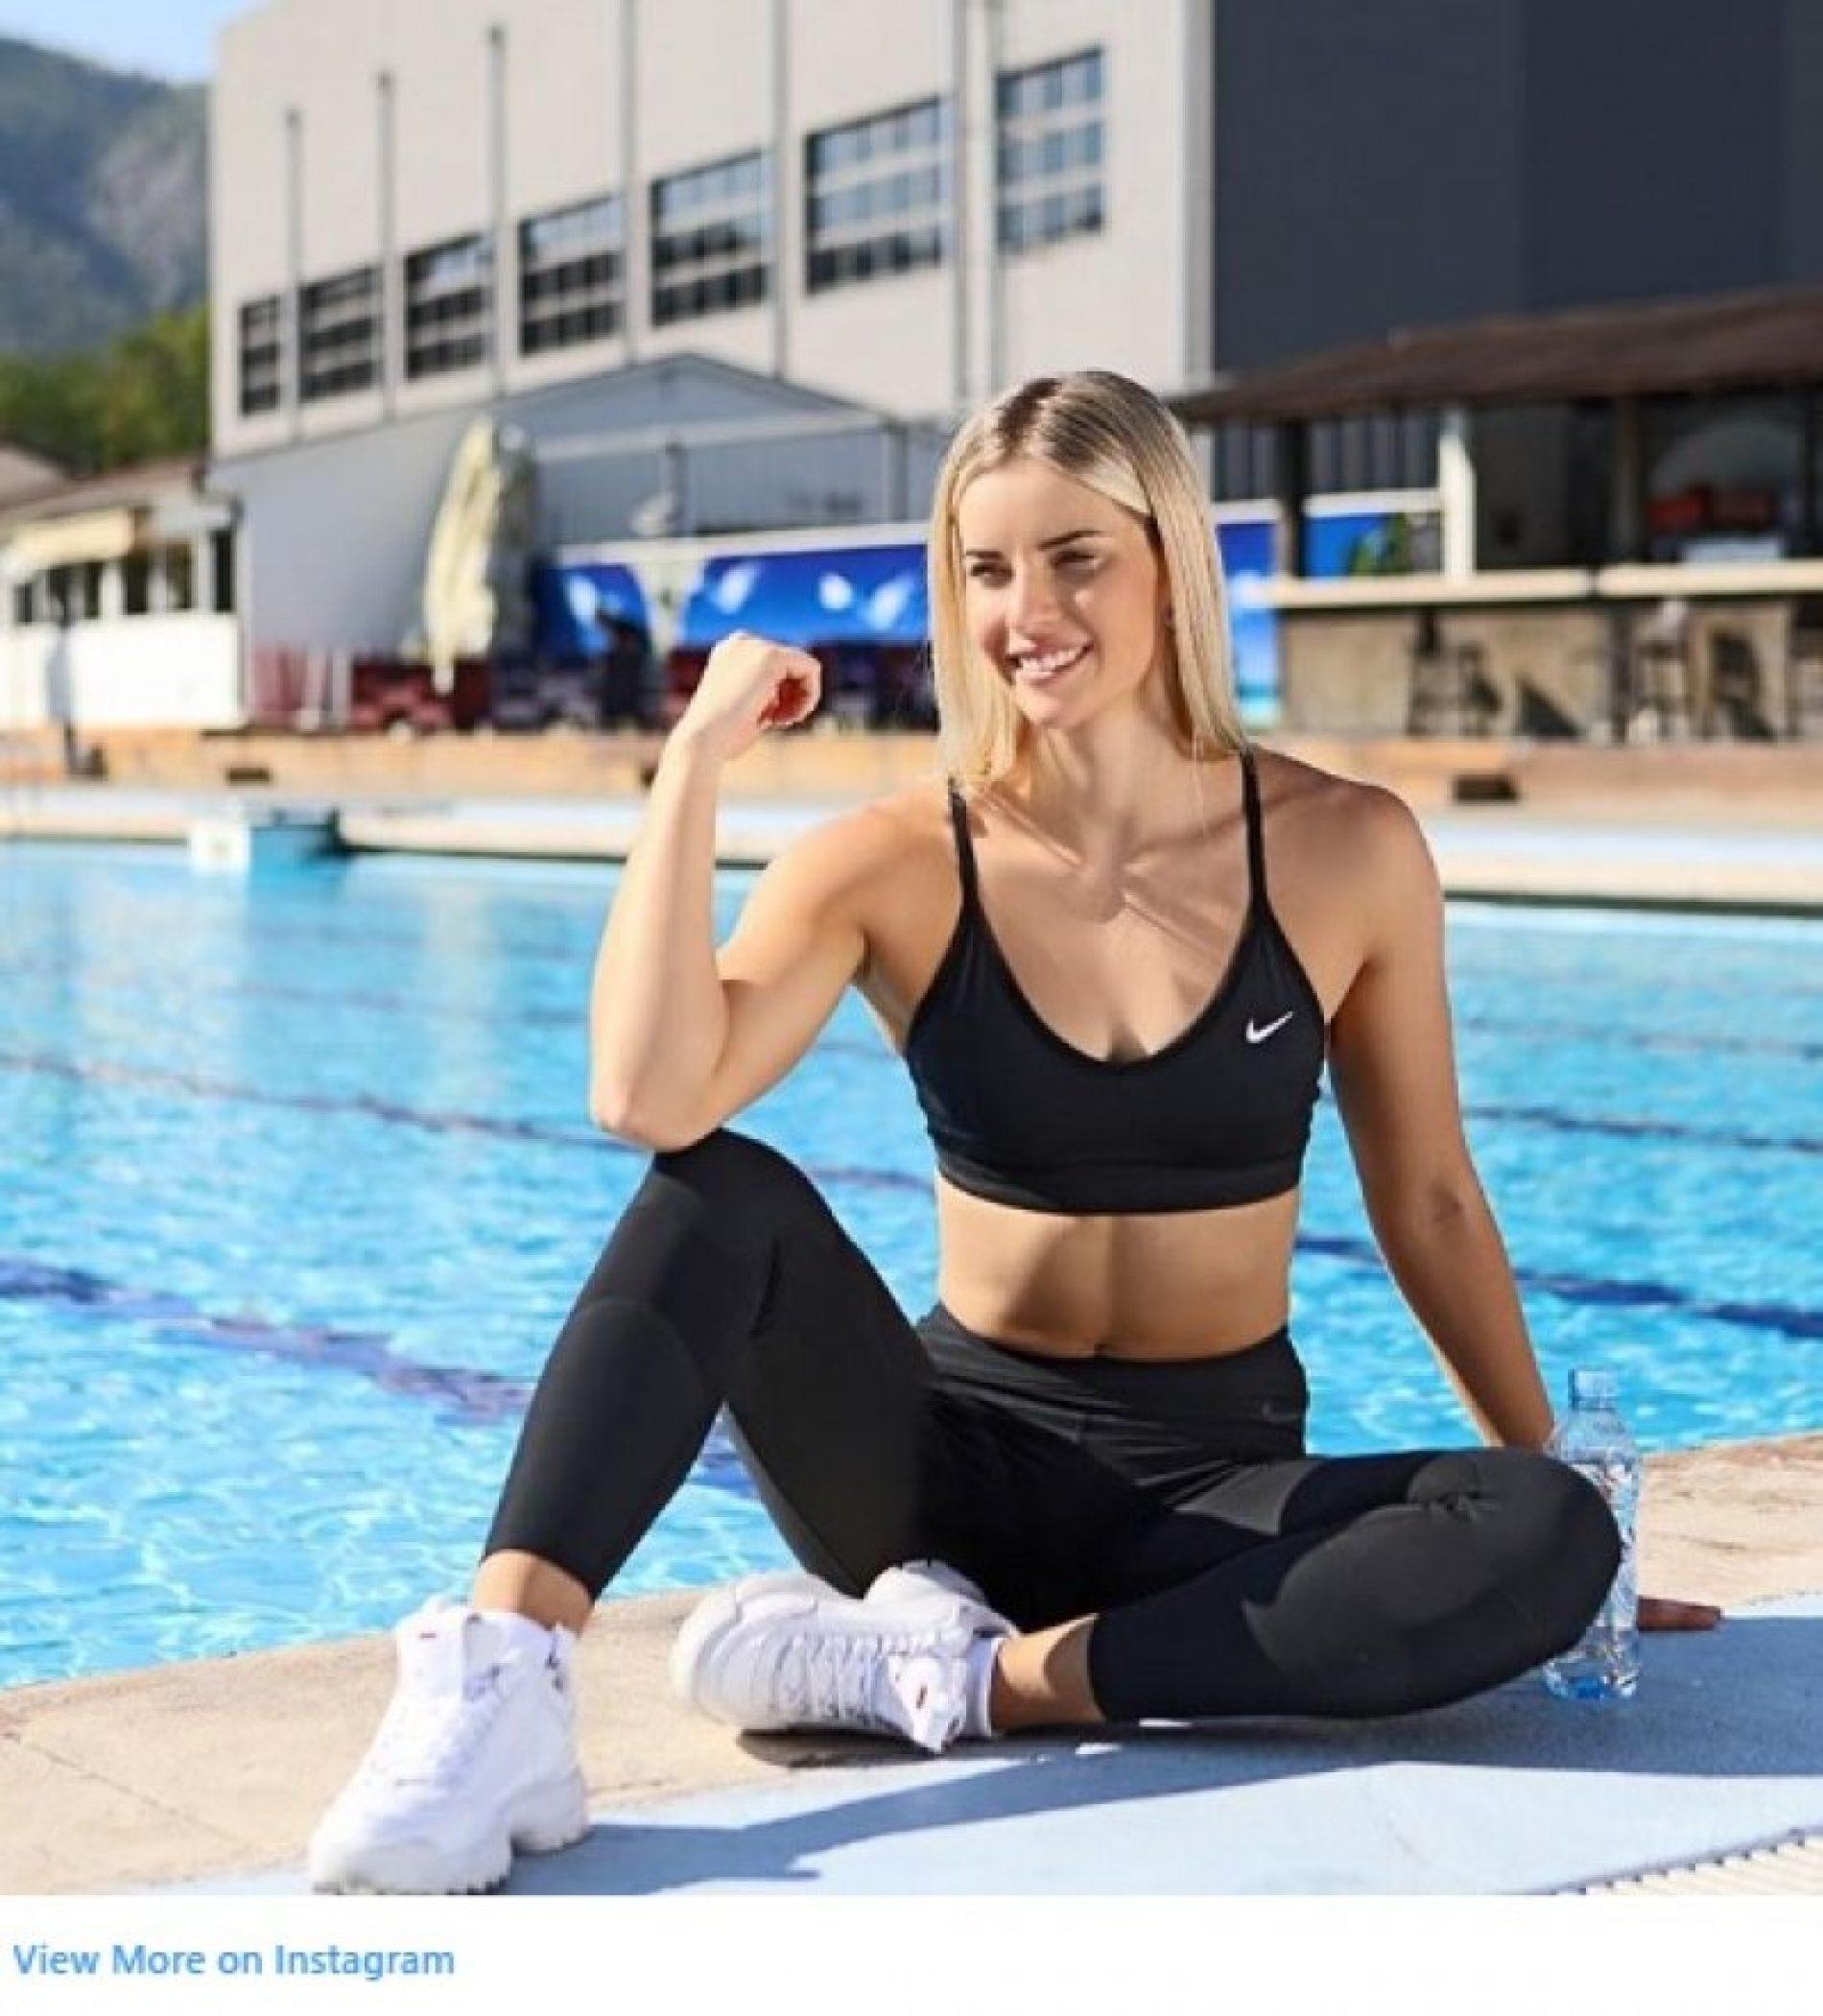 Kajtaz pobijedila na plivačkom mitingu u Zagrebu i postavila nacionalni rekord na 200 metara delfin